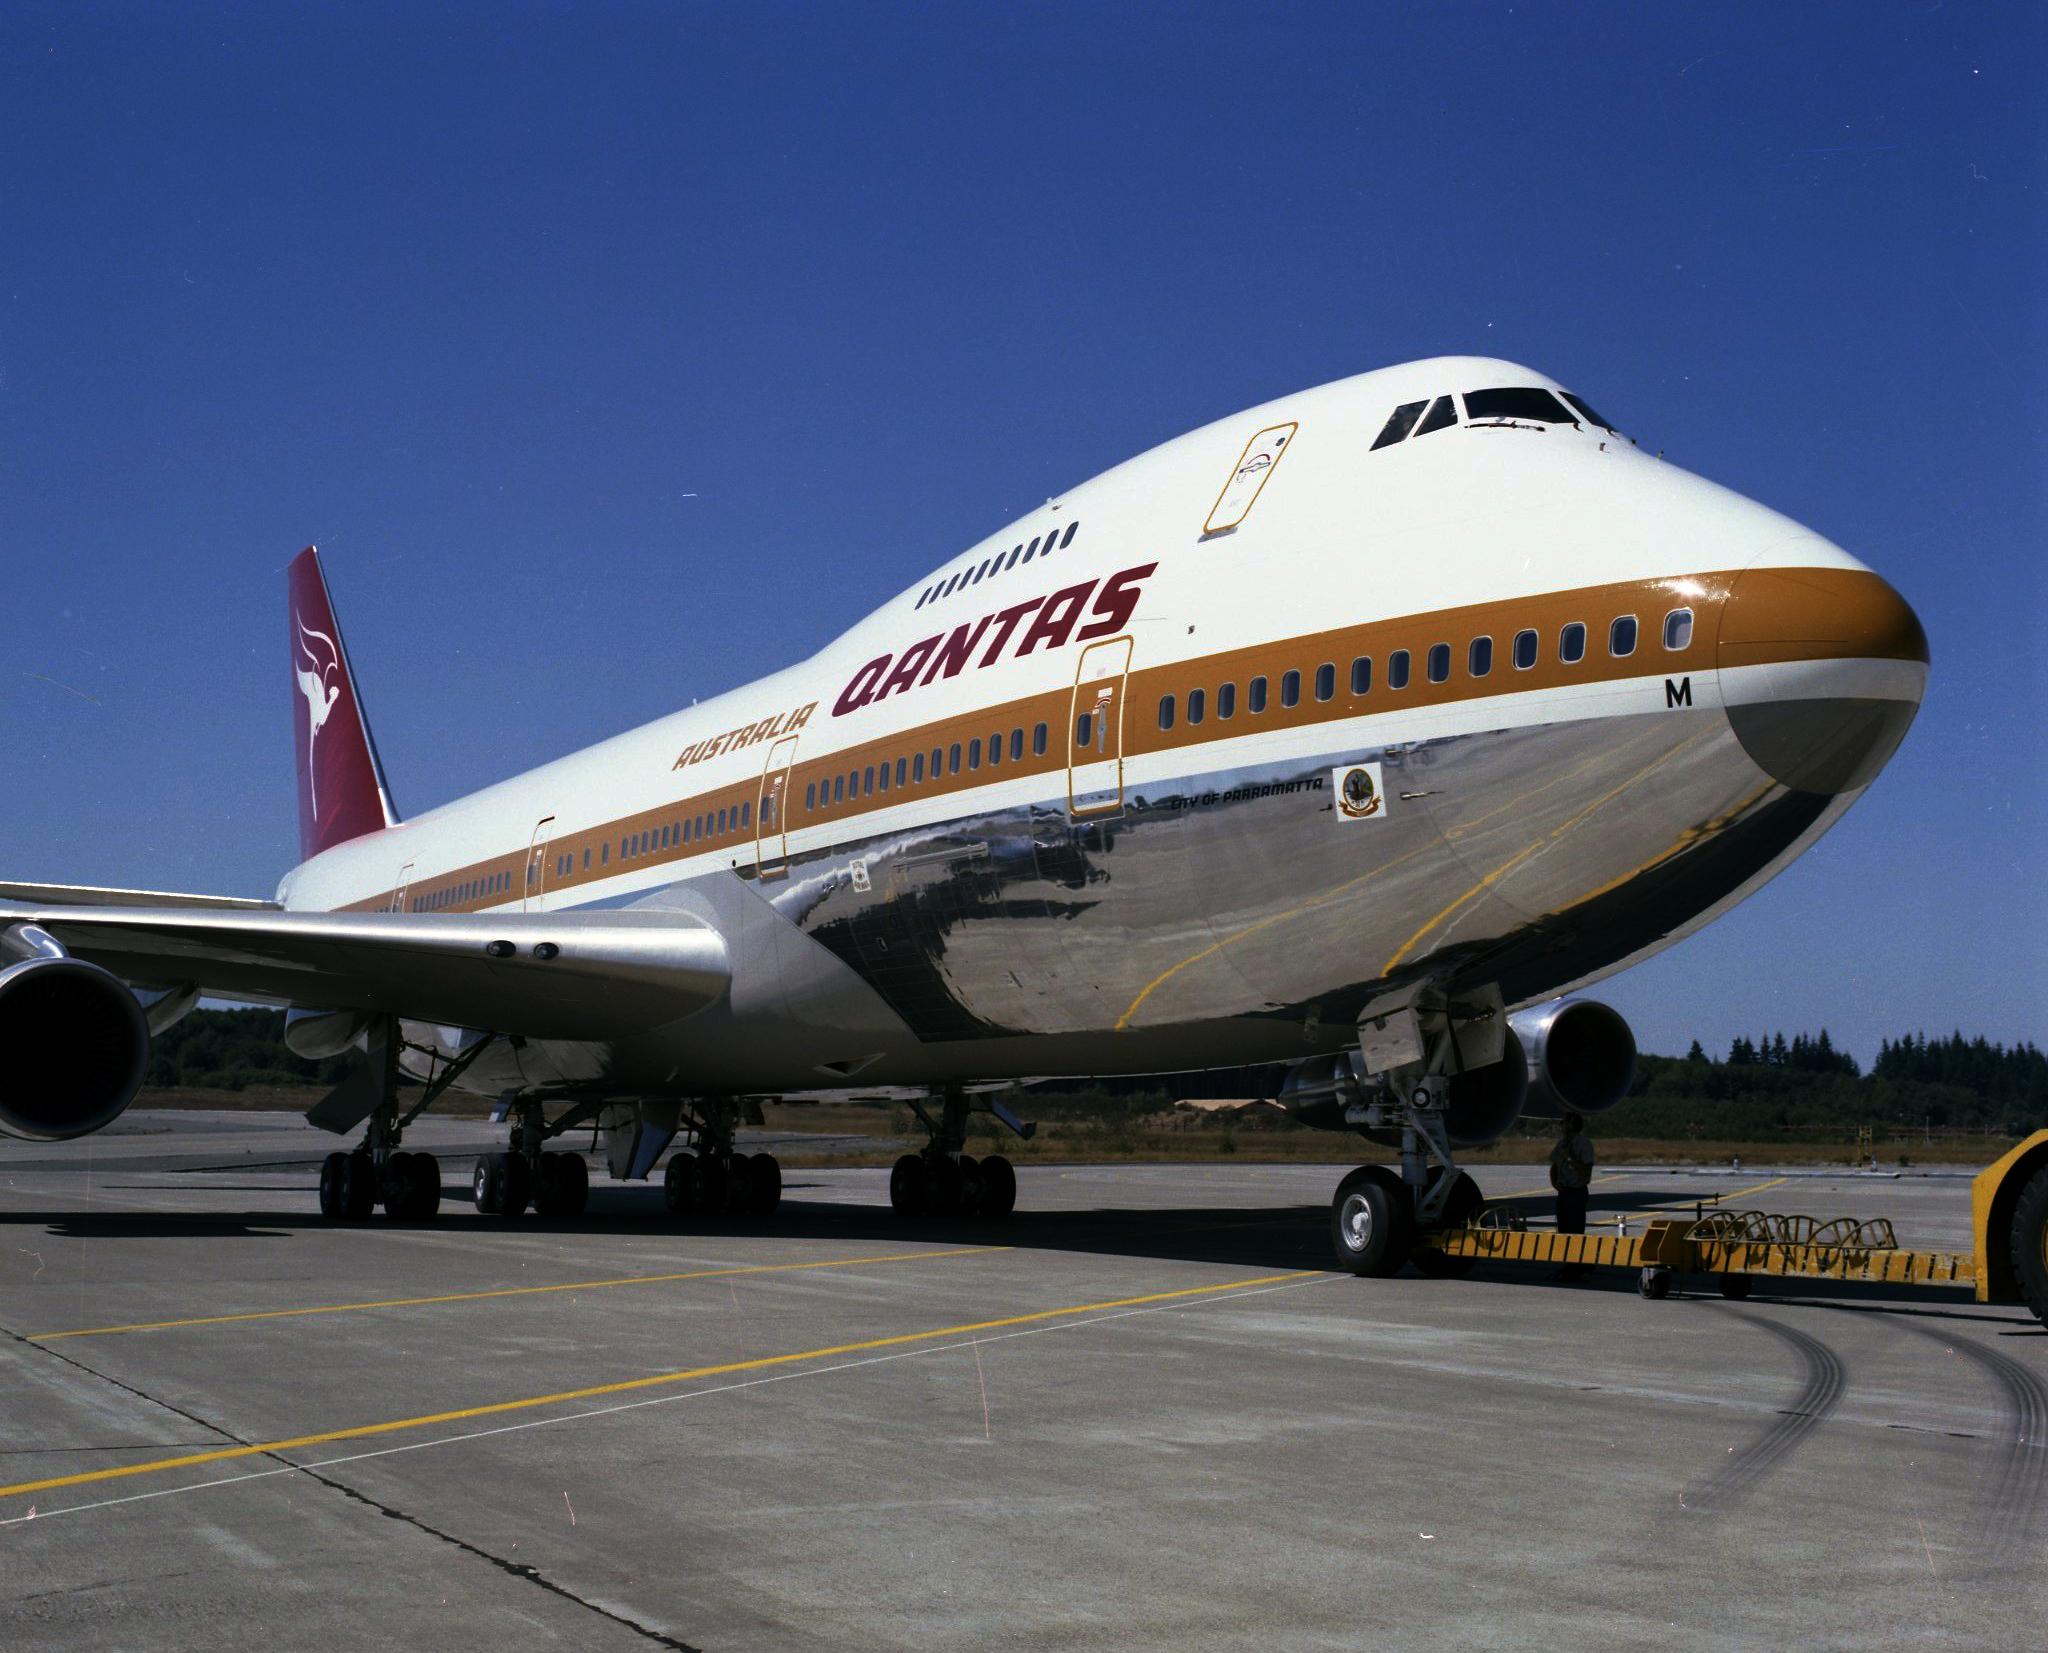 Blue dress mystery 747s